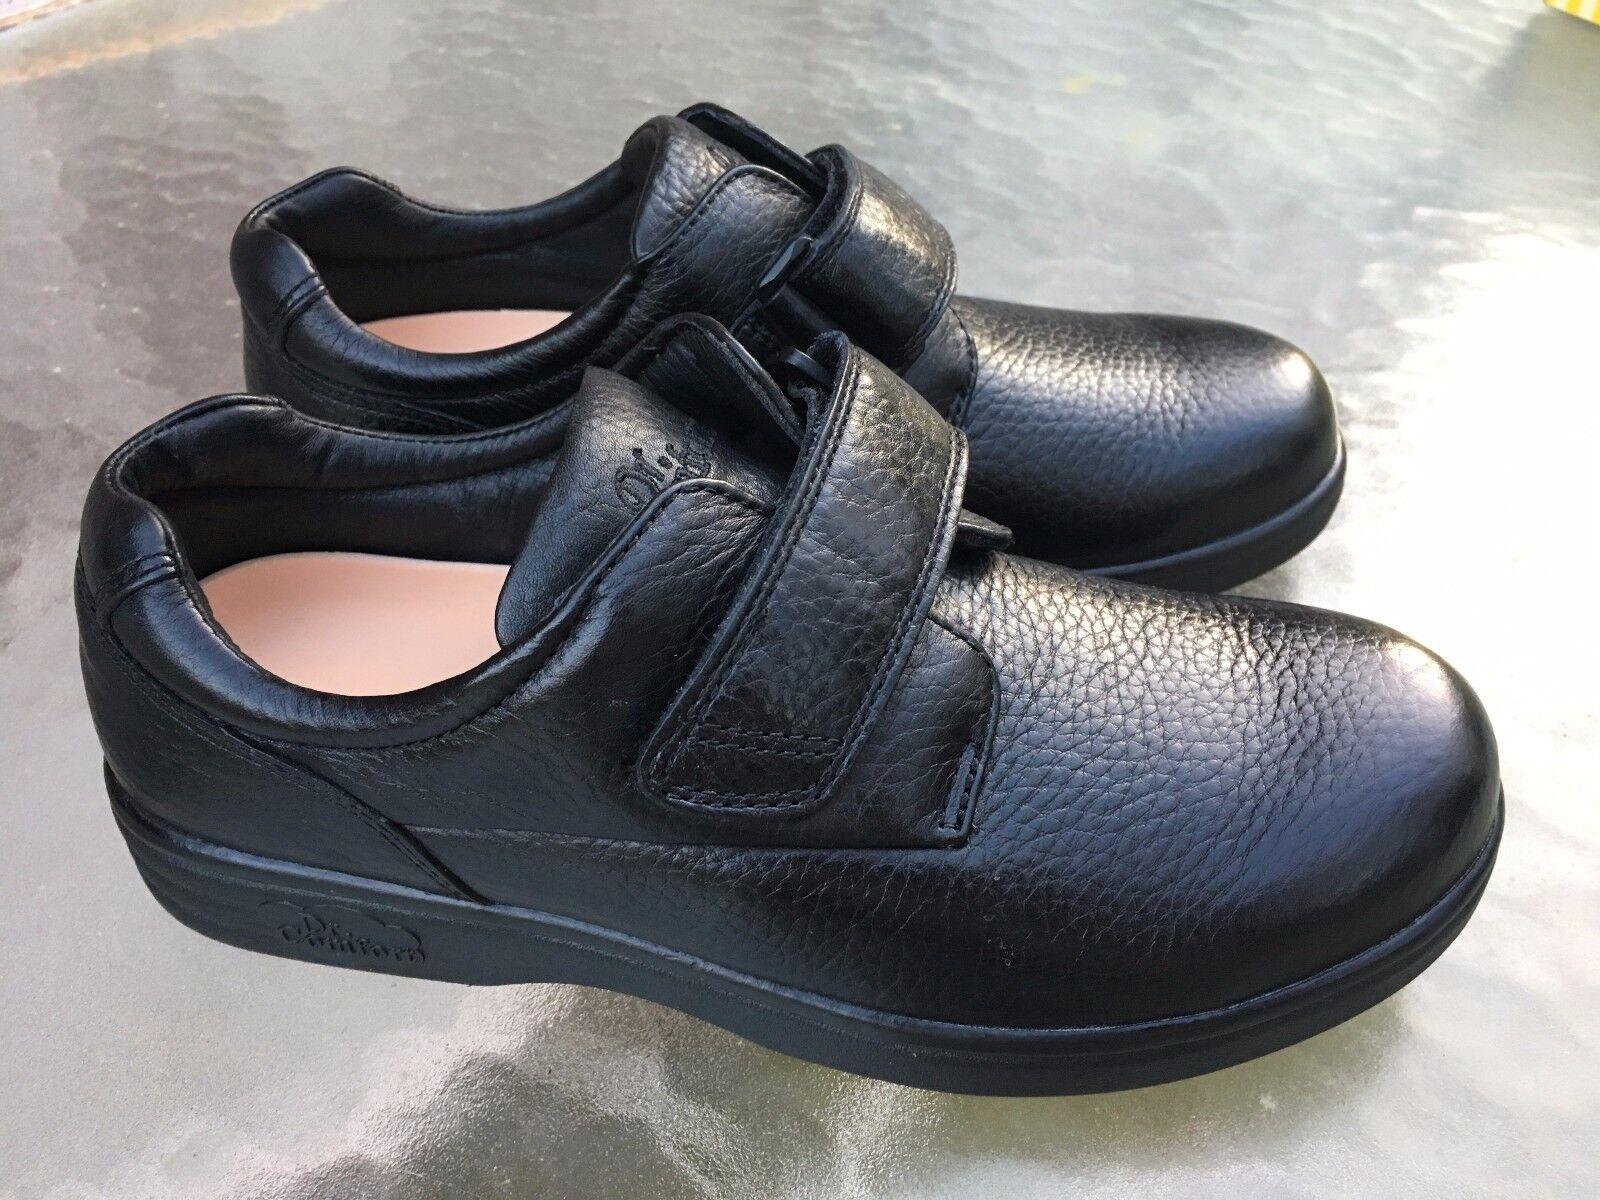 139 Dr Comfort 8M MAGGY Diabetic Extra Depth Orthotics Gel Insoles Nurse Shoes